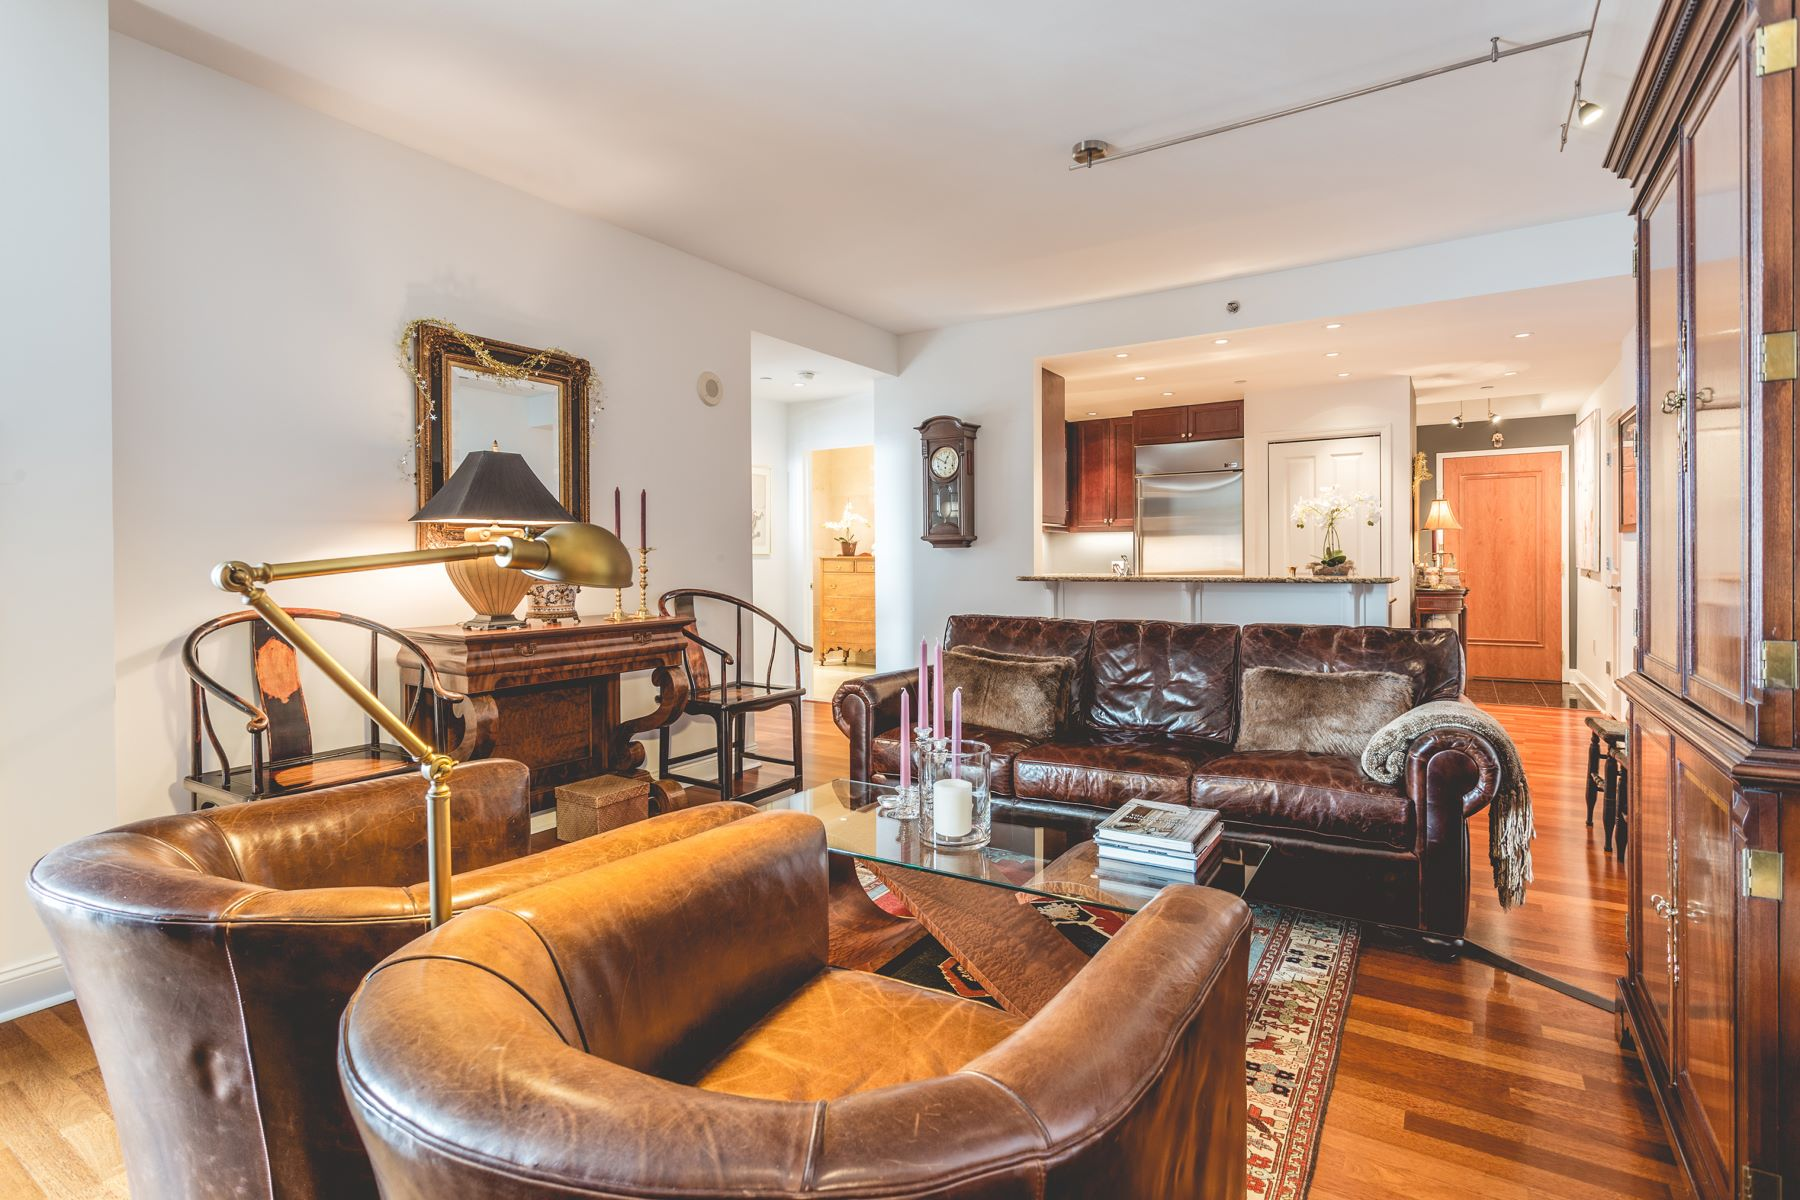 Condomínio para Venda às 440 S Broad St #1804 440 S BROAD ST #1804 1804, Philadelphia, Pensilvânia, 19146 Estados Unidos